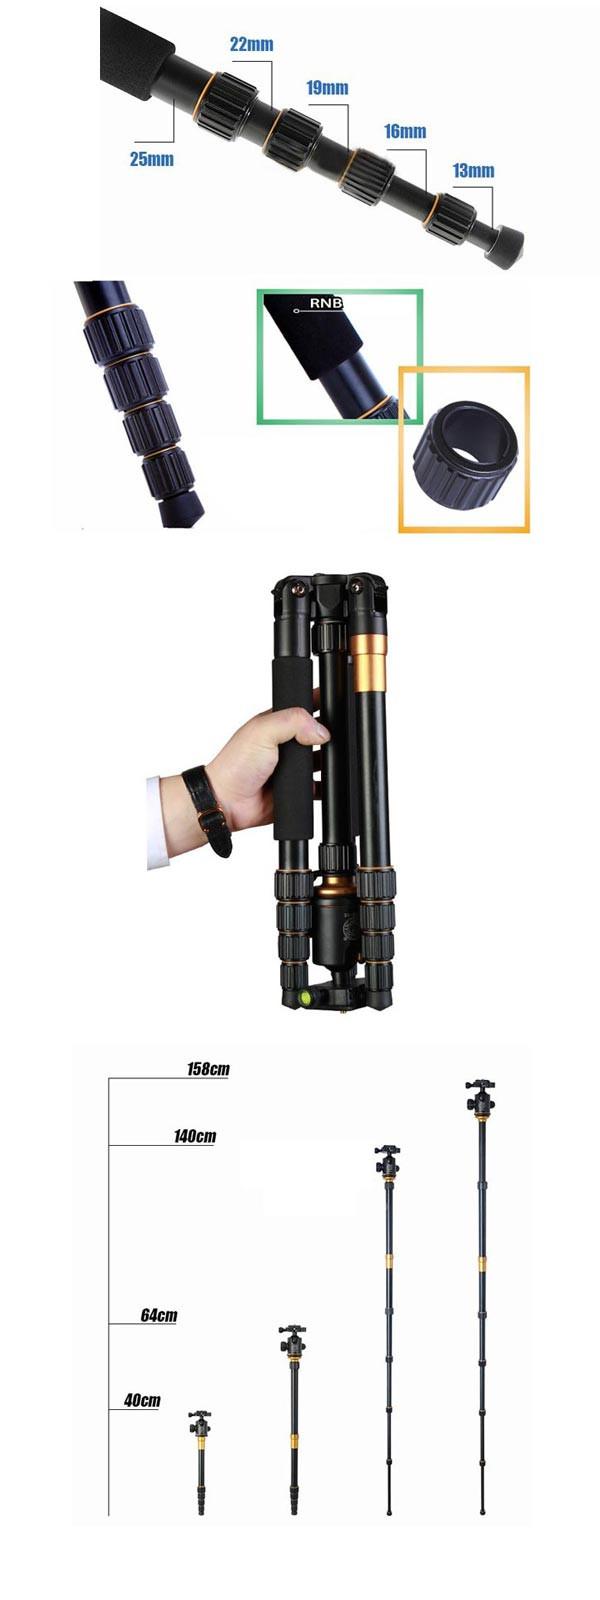 Qzsd Q666 15kg Tripod With Q 02 360 Degree Swivel Fluid Head For Beike Dslr Camera